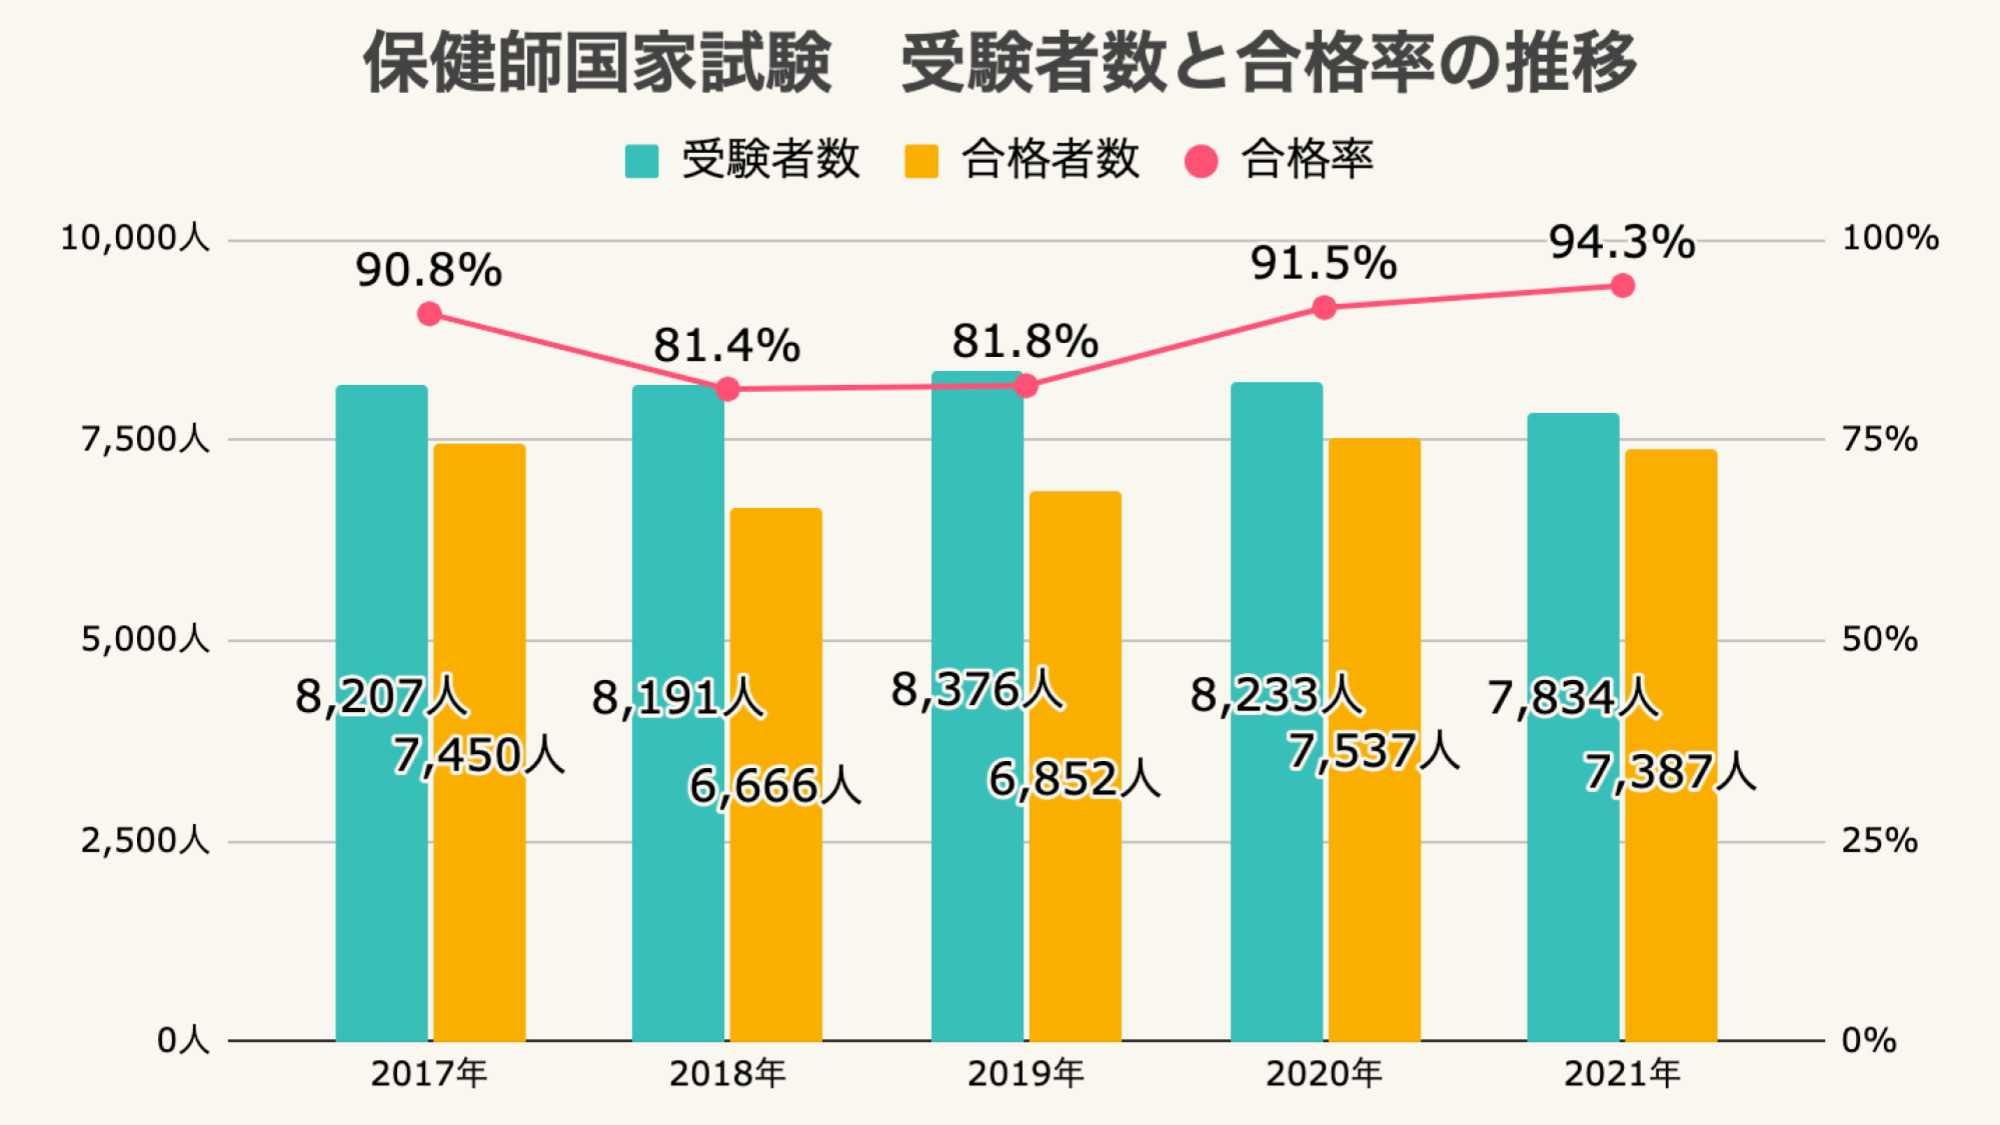 保健師国家試験の受験者数と合格率推移